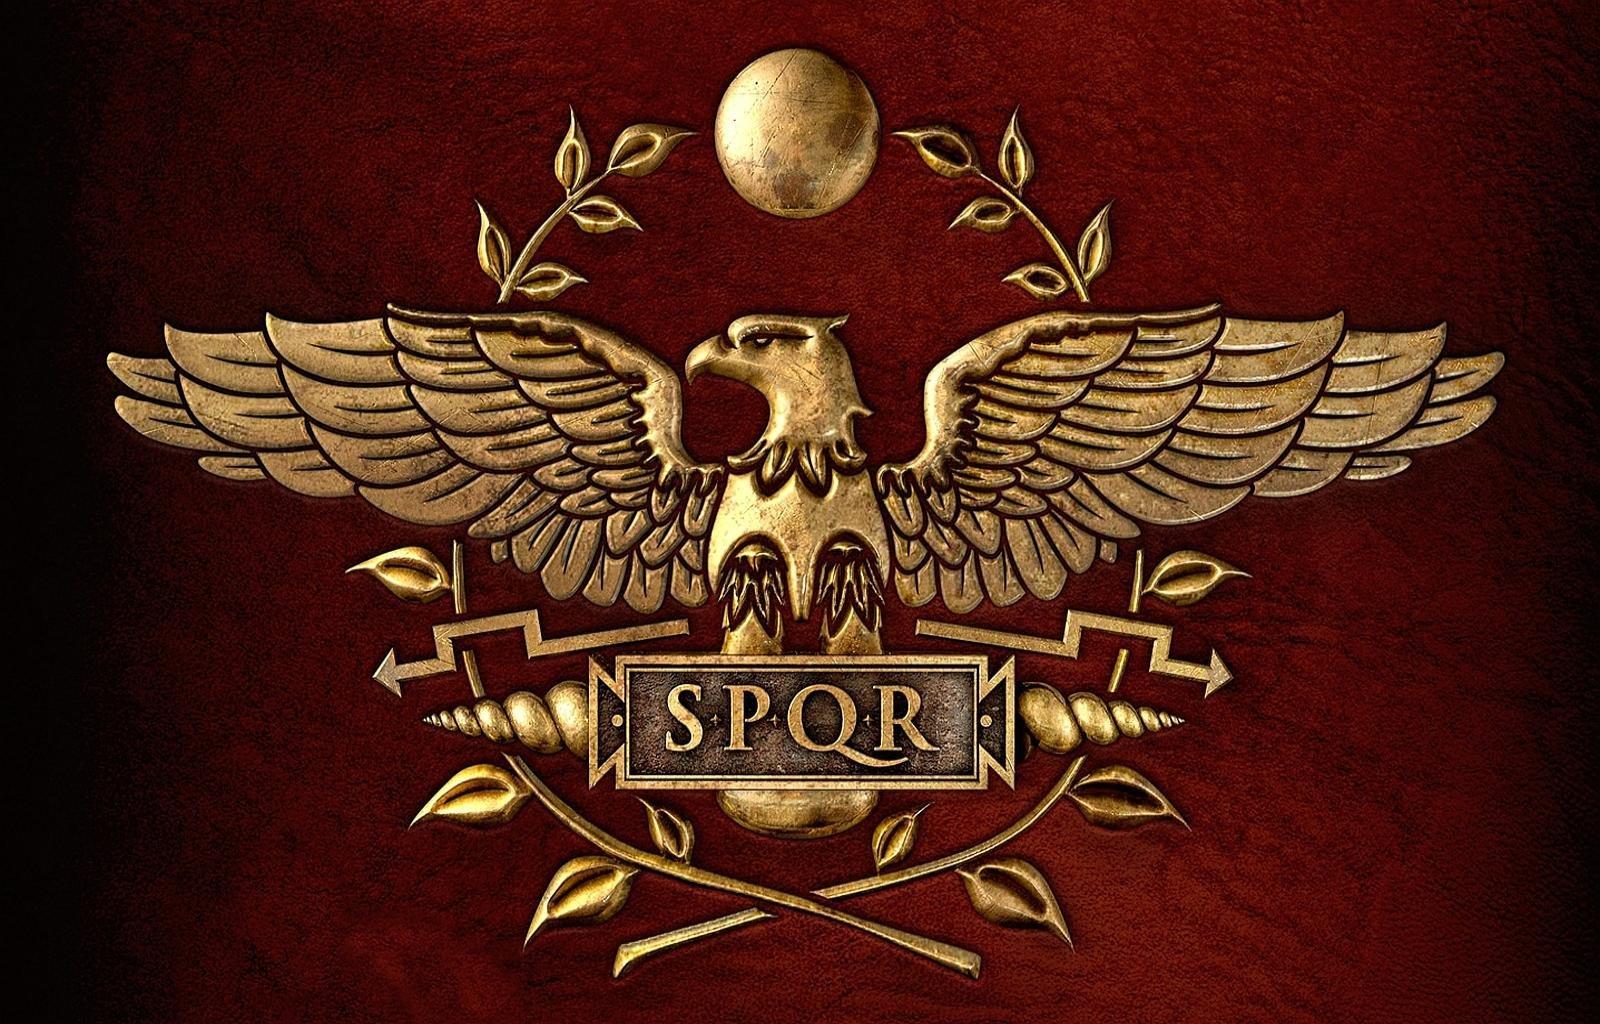 Total War: Rome II wallpapers HD for desktop backgrounds